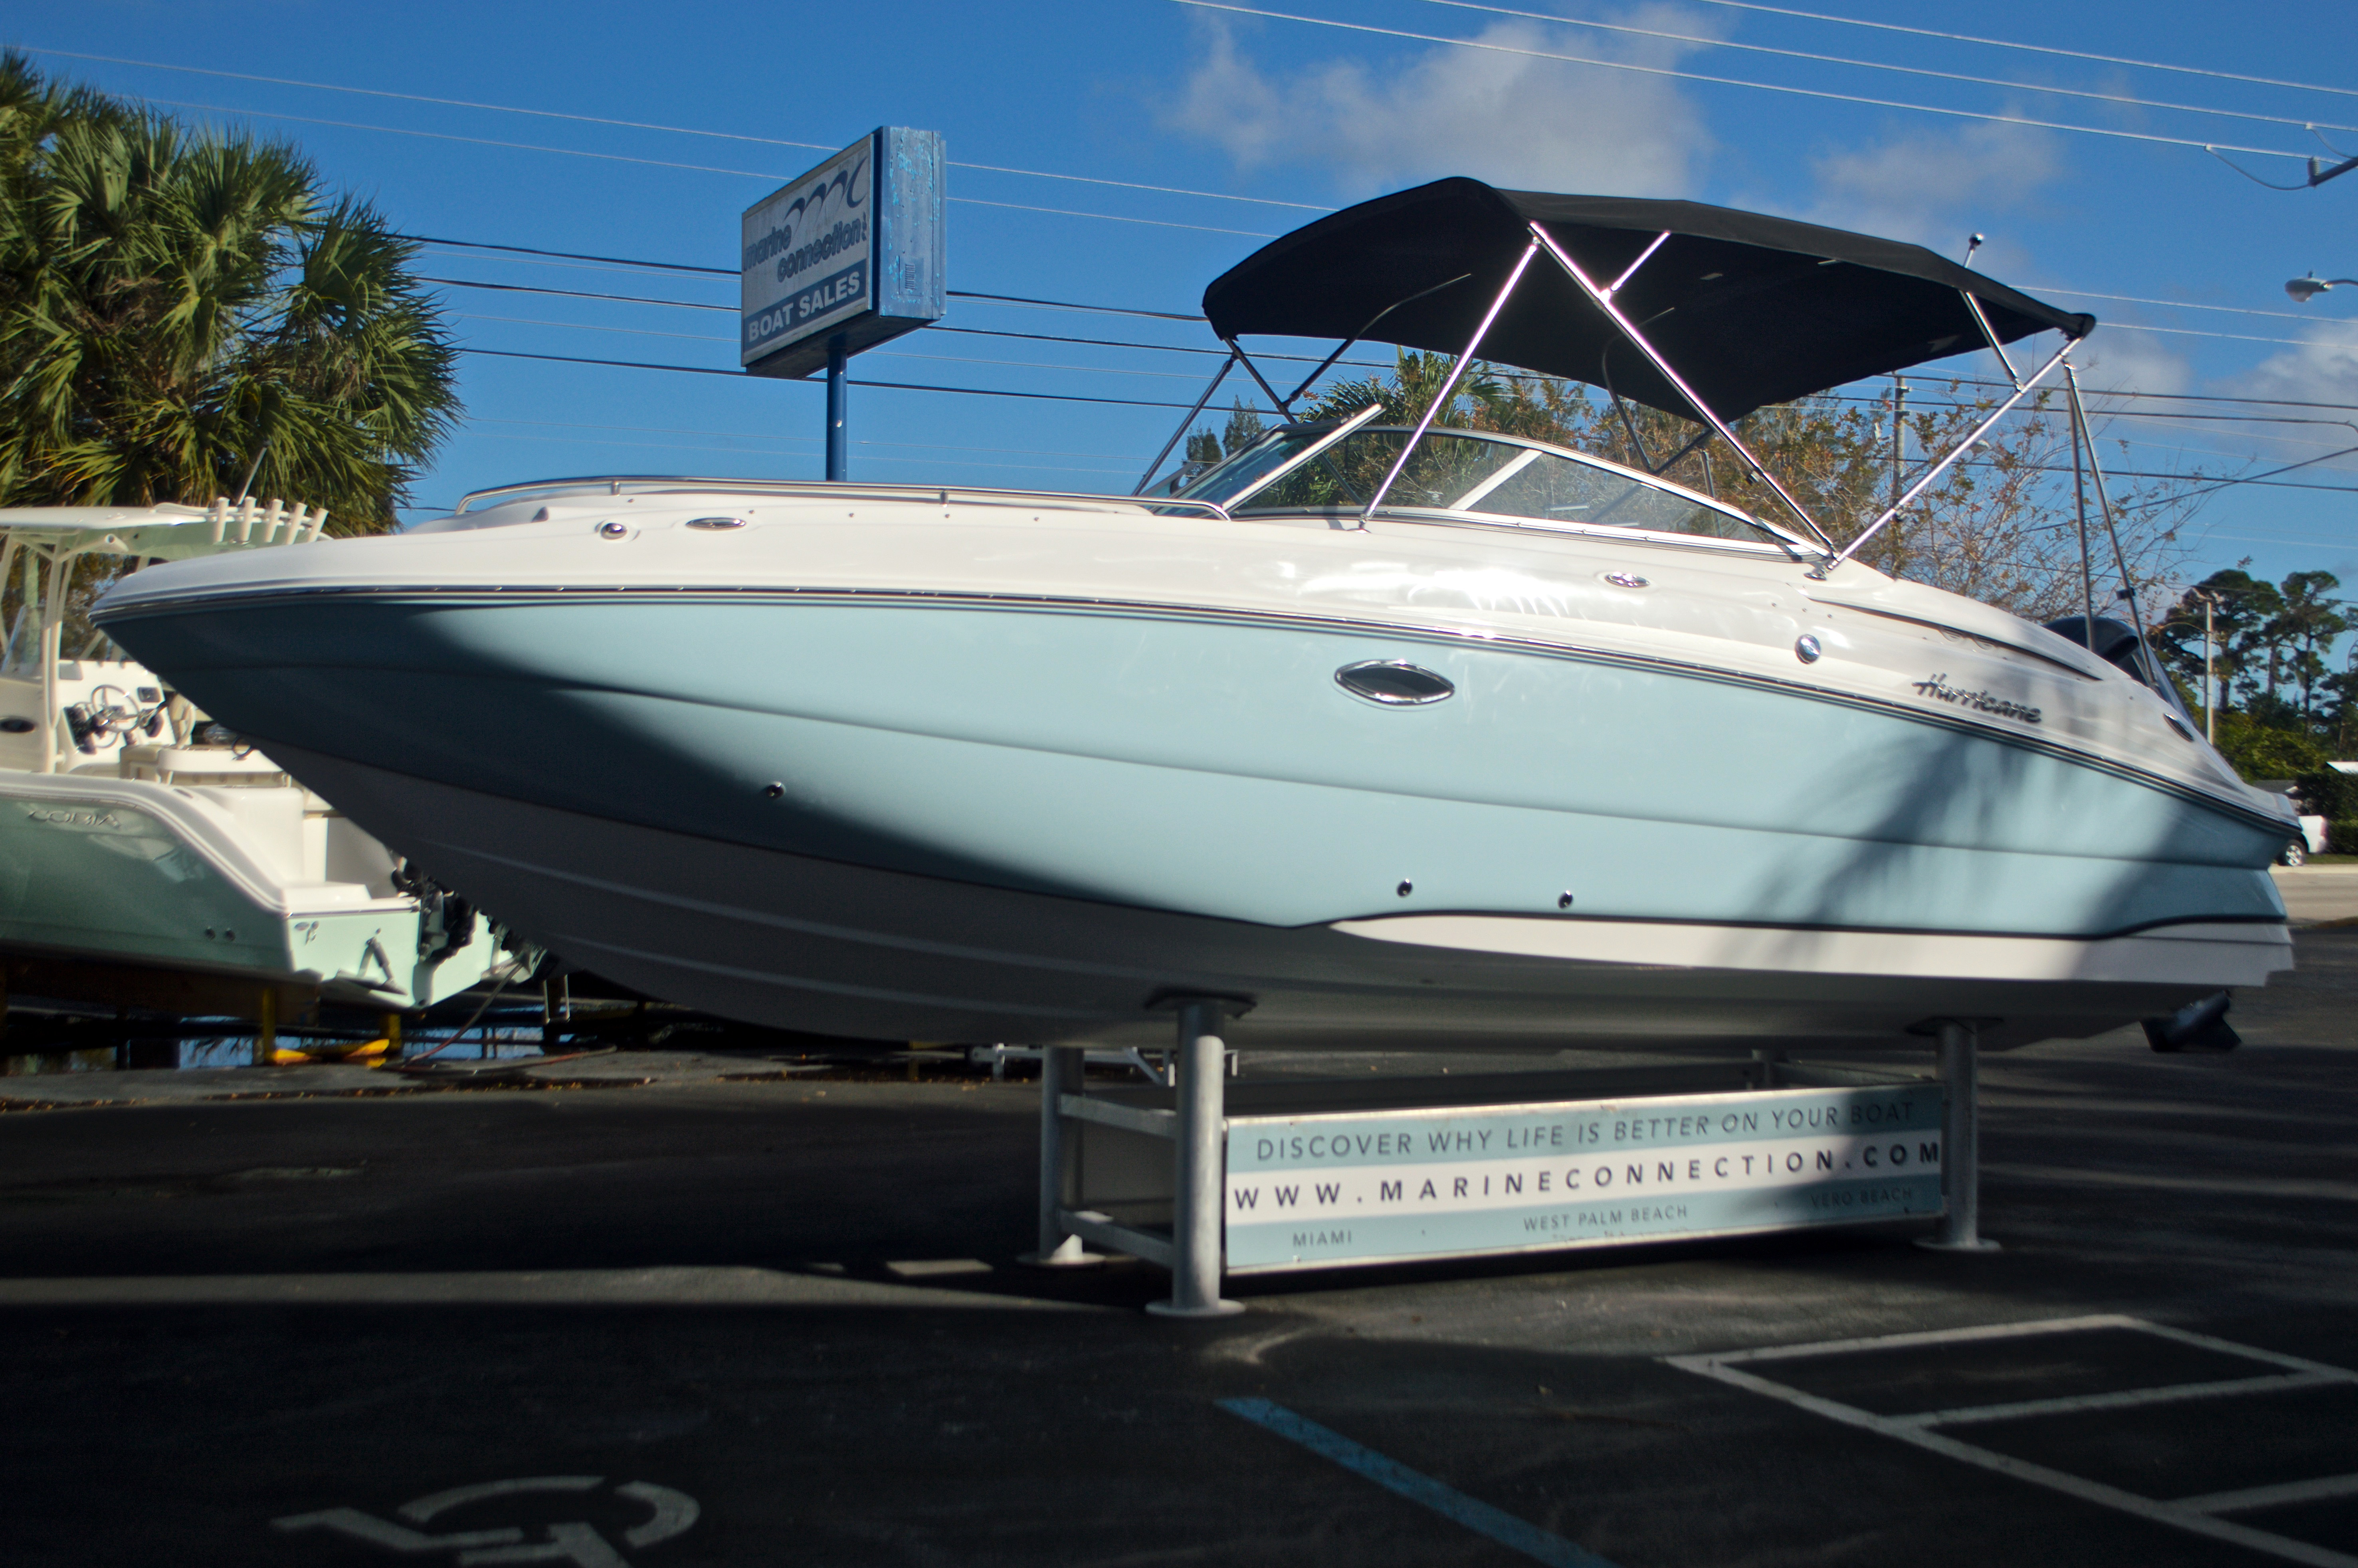 Thumbnail 3 for New 2017 Hurricane SunDeck SD 2400 OB boat for sale in Miami, FL